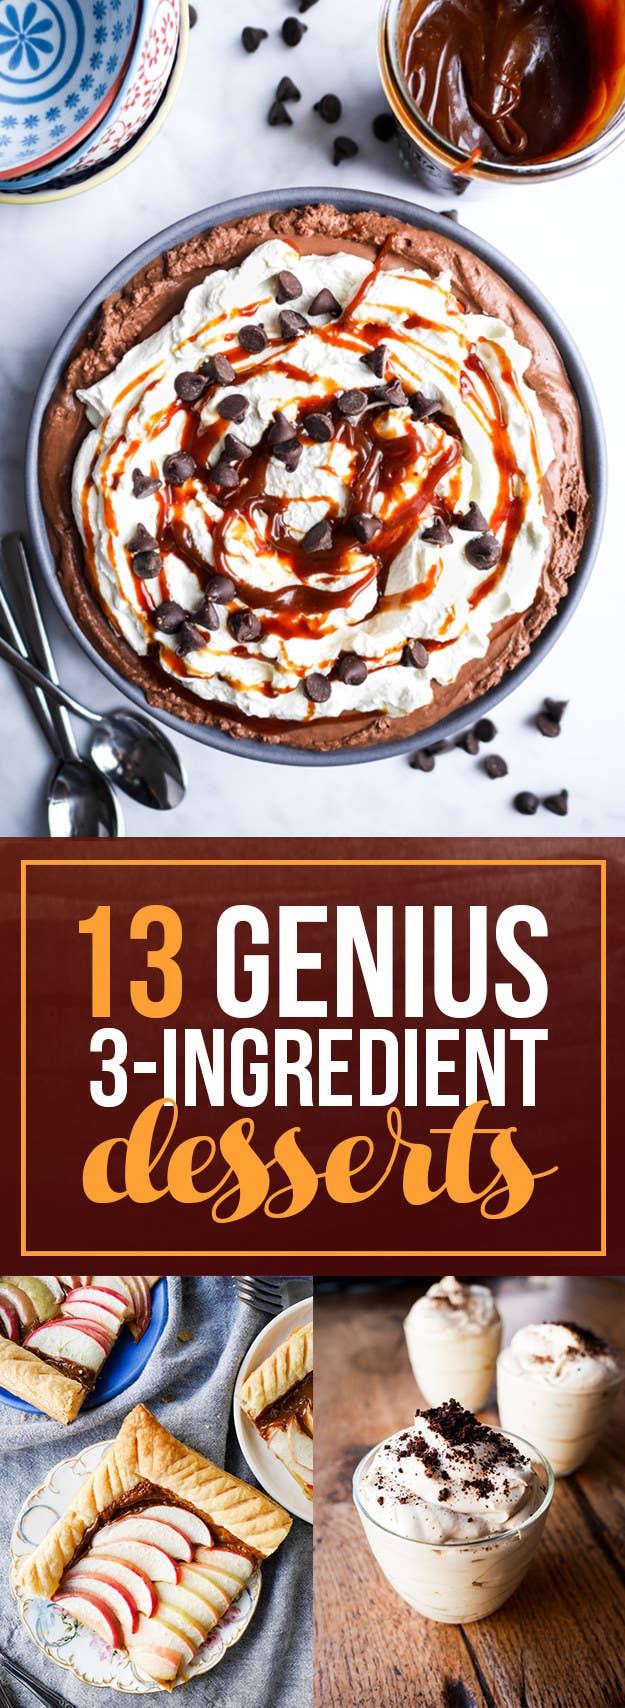 13 Insanely Easy Three-Ingredient Desserts